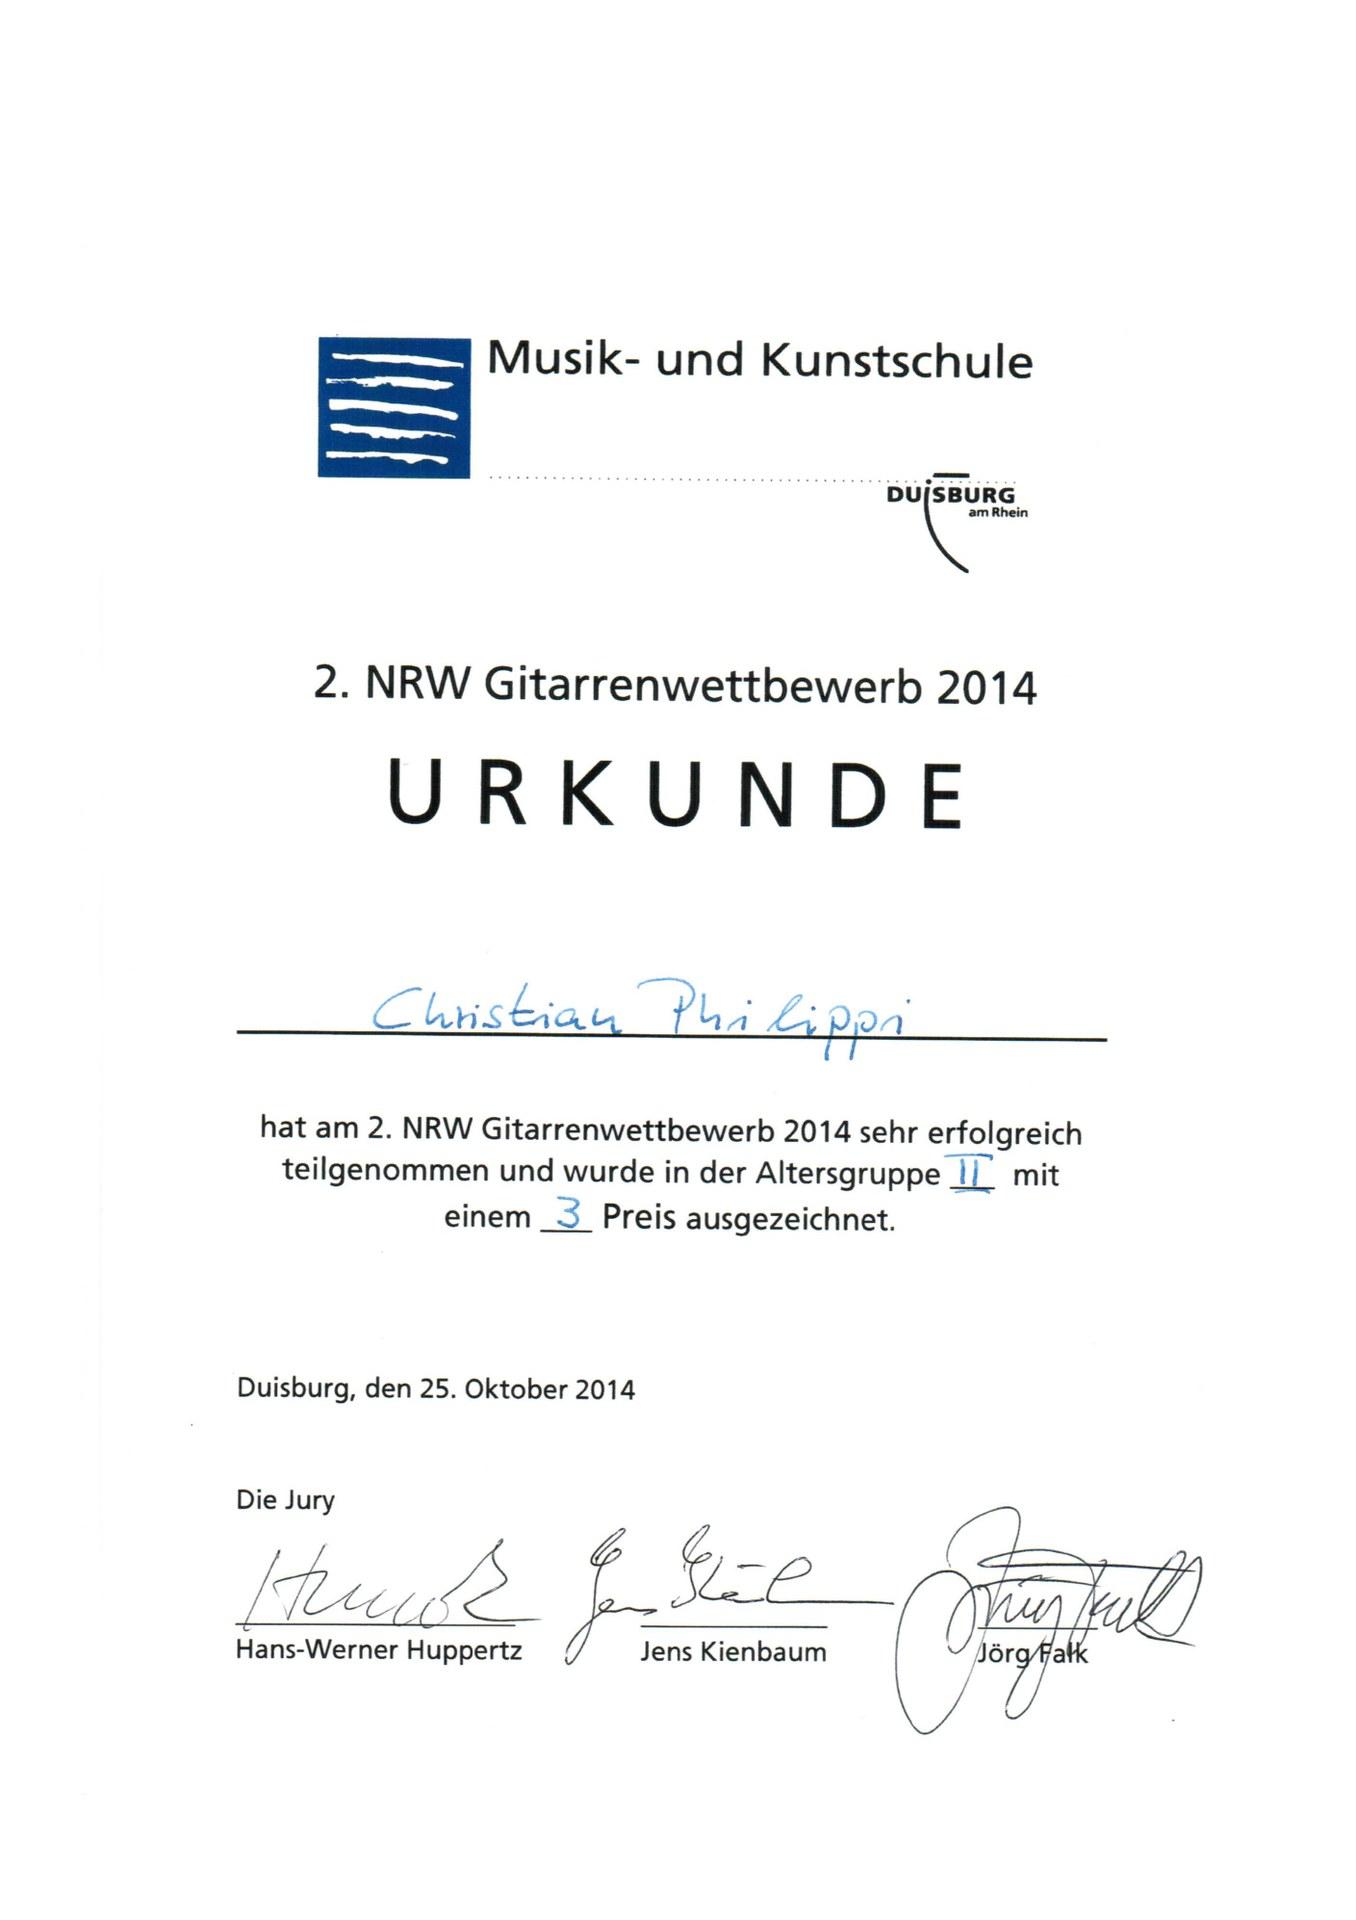 Urkunde Gitarrenwettbewerb.jpg